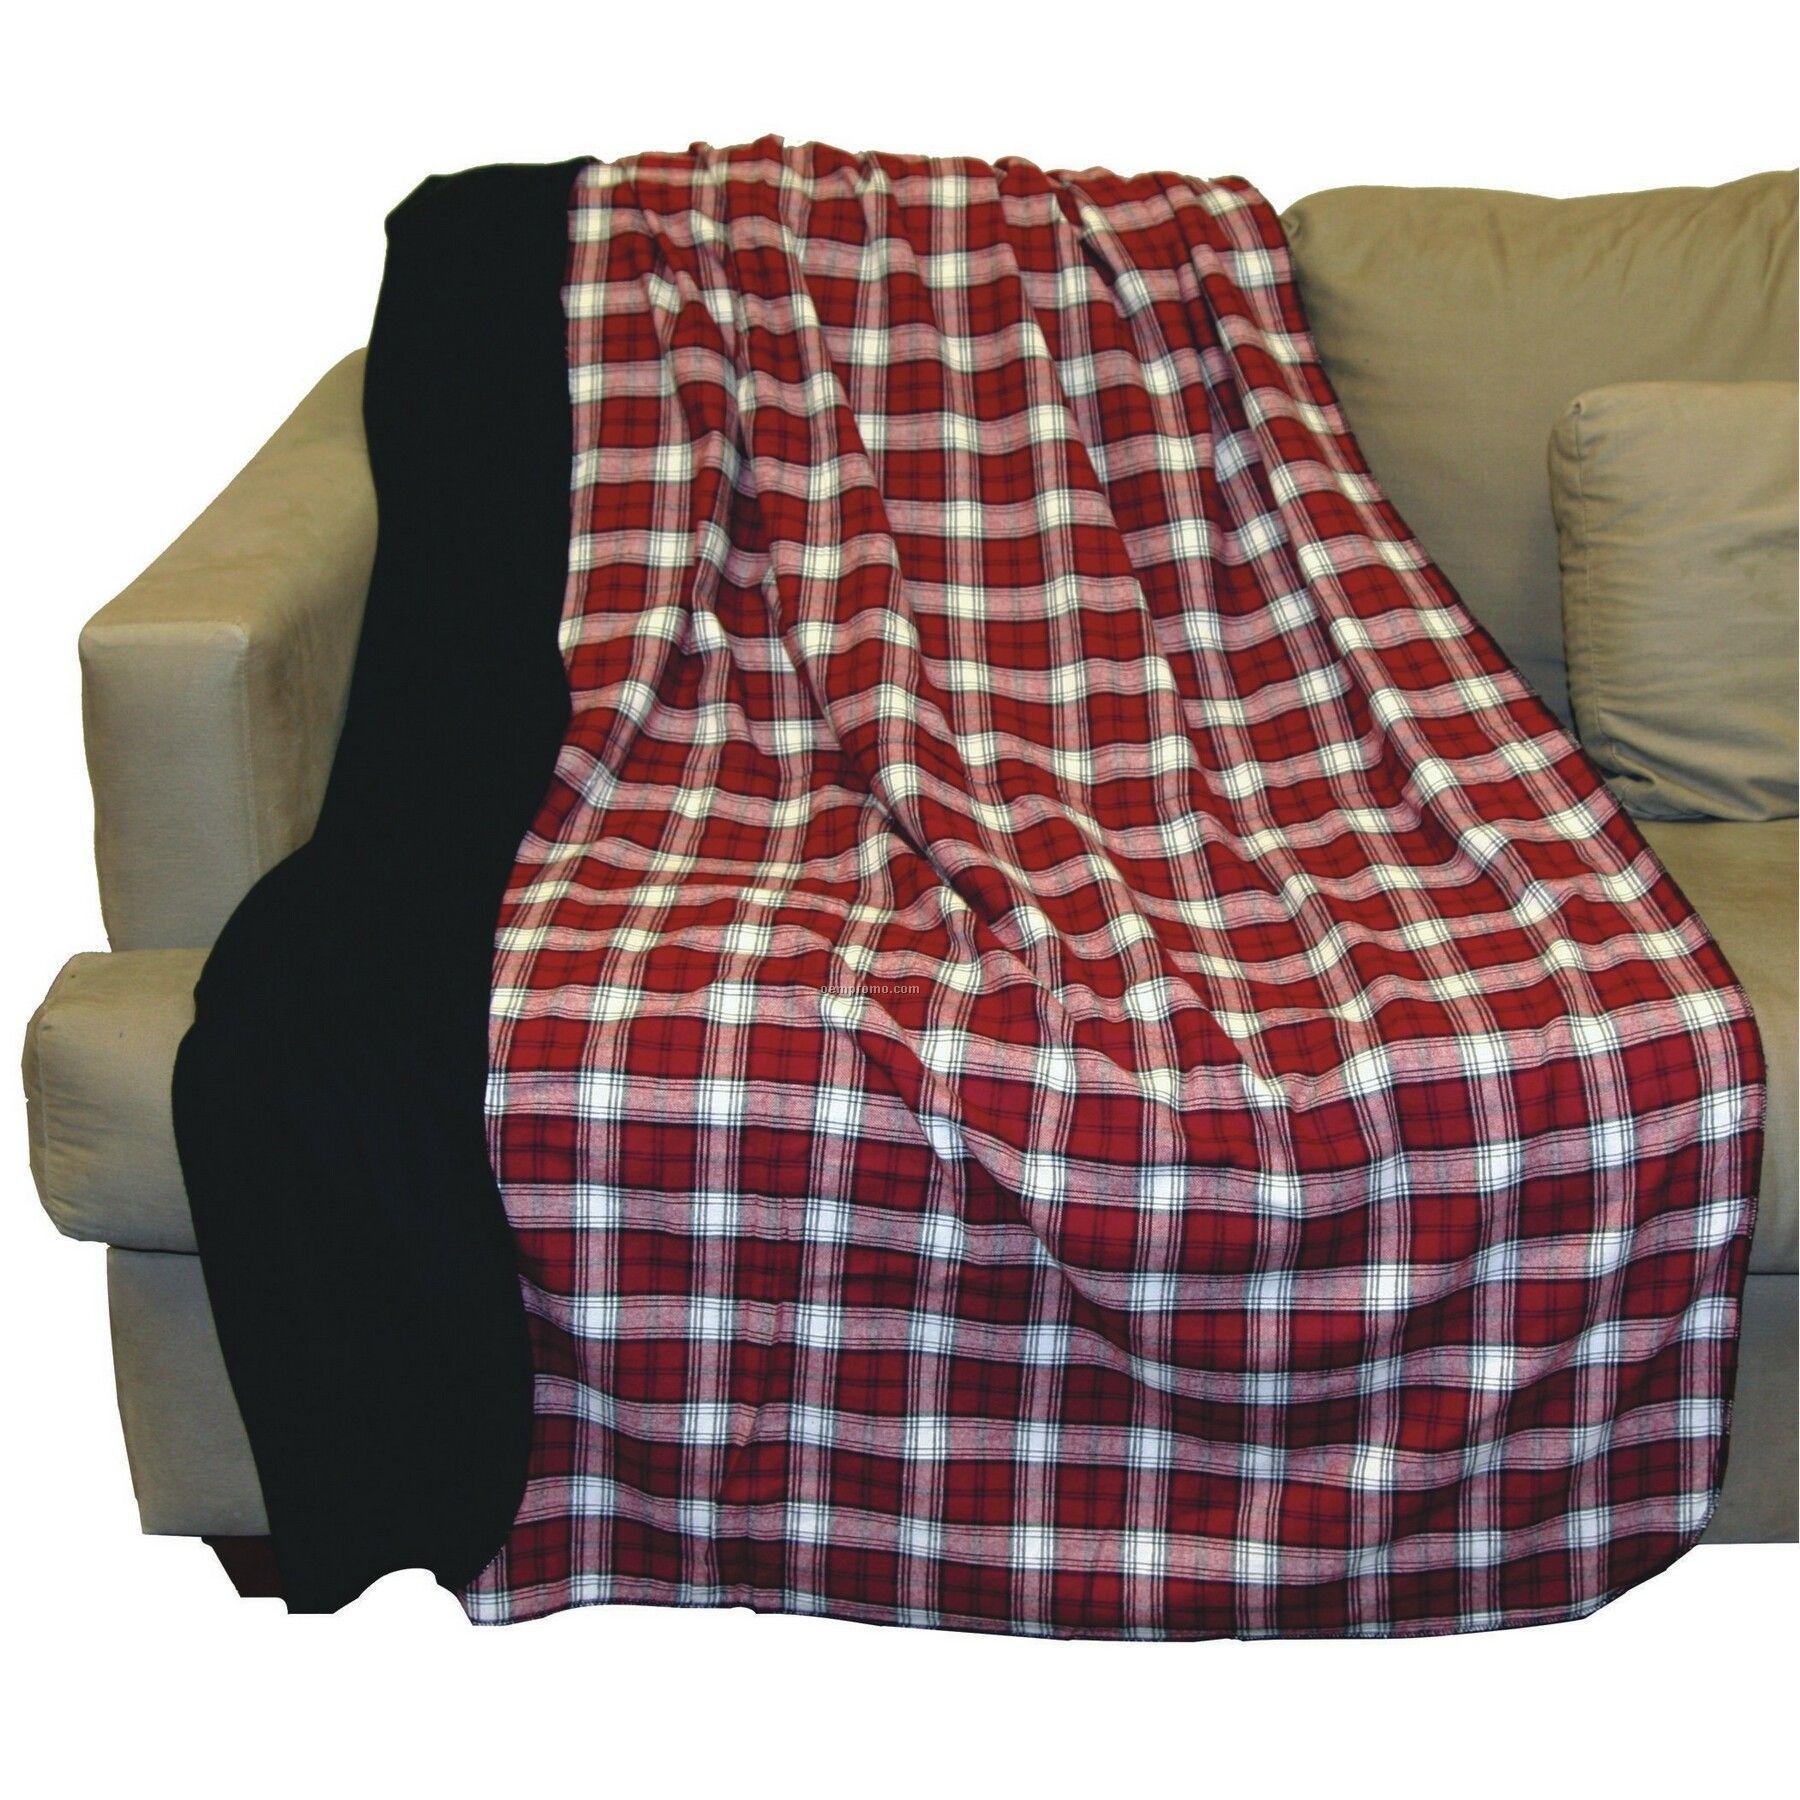 30+ items· Buy30+ items· BuyTartan Wool Blanketsfrom Reliable China30+ items· Buy30+ items· BuyTartan Wool Blanketsfrom Reliable ChinaTartan Wool Blanketssuppliers.Find Quality30+ items· Buy30+ items· BuyTartan Wool Blanketsfrom Reliable China30+ items· Buy30+ items· BuyTartan Wool Blanketsfrom Reliable ChinaTartan Wool Blanketssuppliers.Find QualityTartan Wool BlanketsWomen's Clothing & …